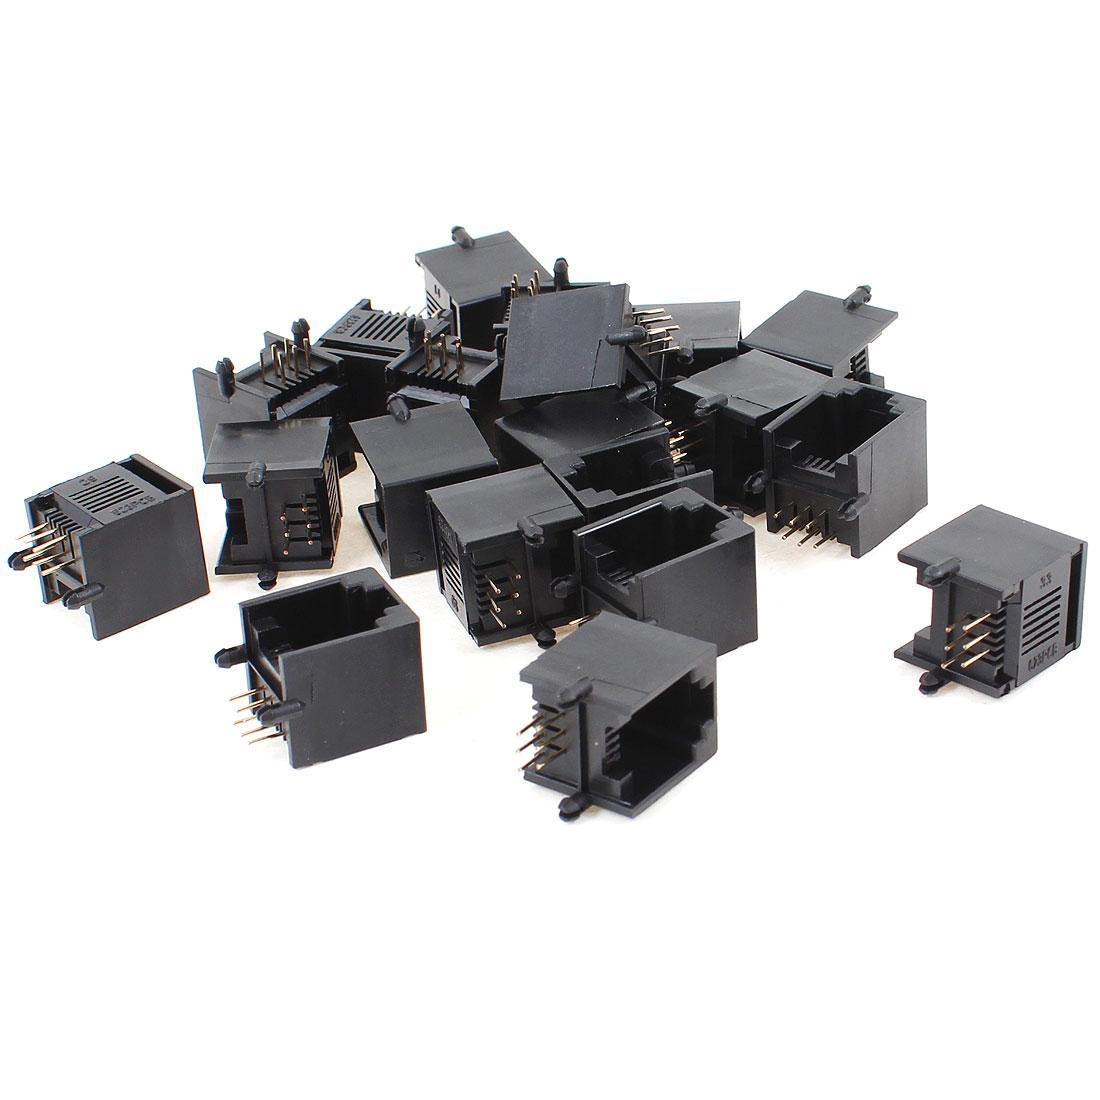 20 Pcs Black Plastic Unshielded RJ12 6P6C Network Modular PCB Connector Jacks